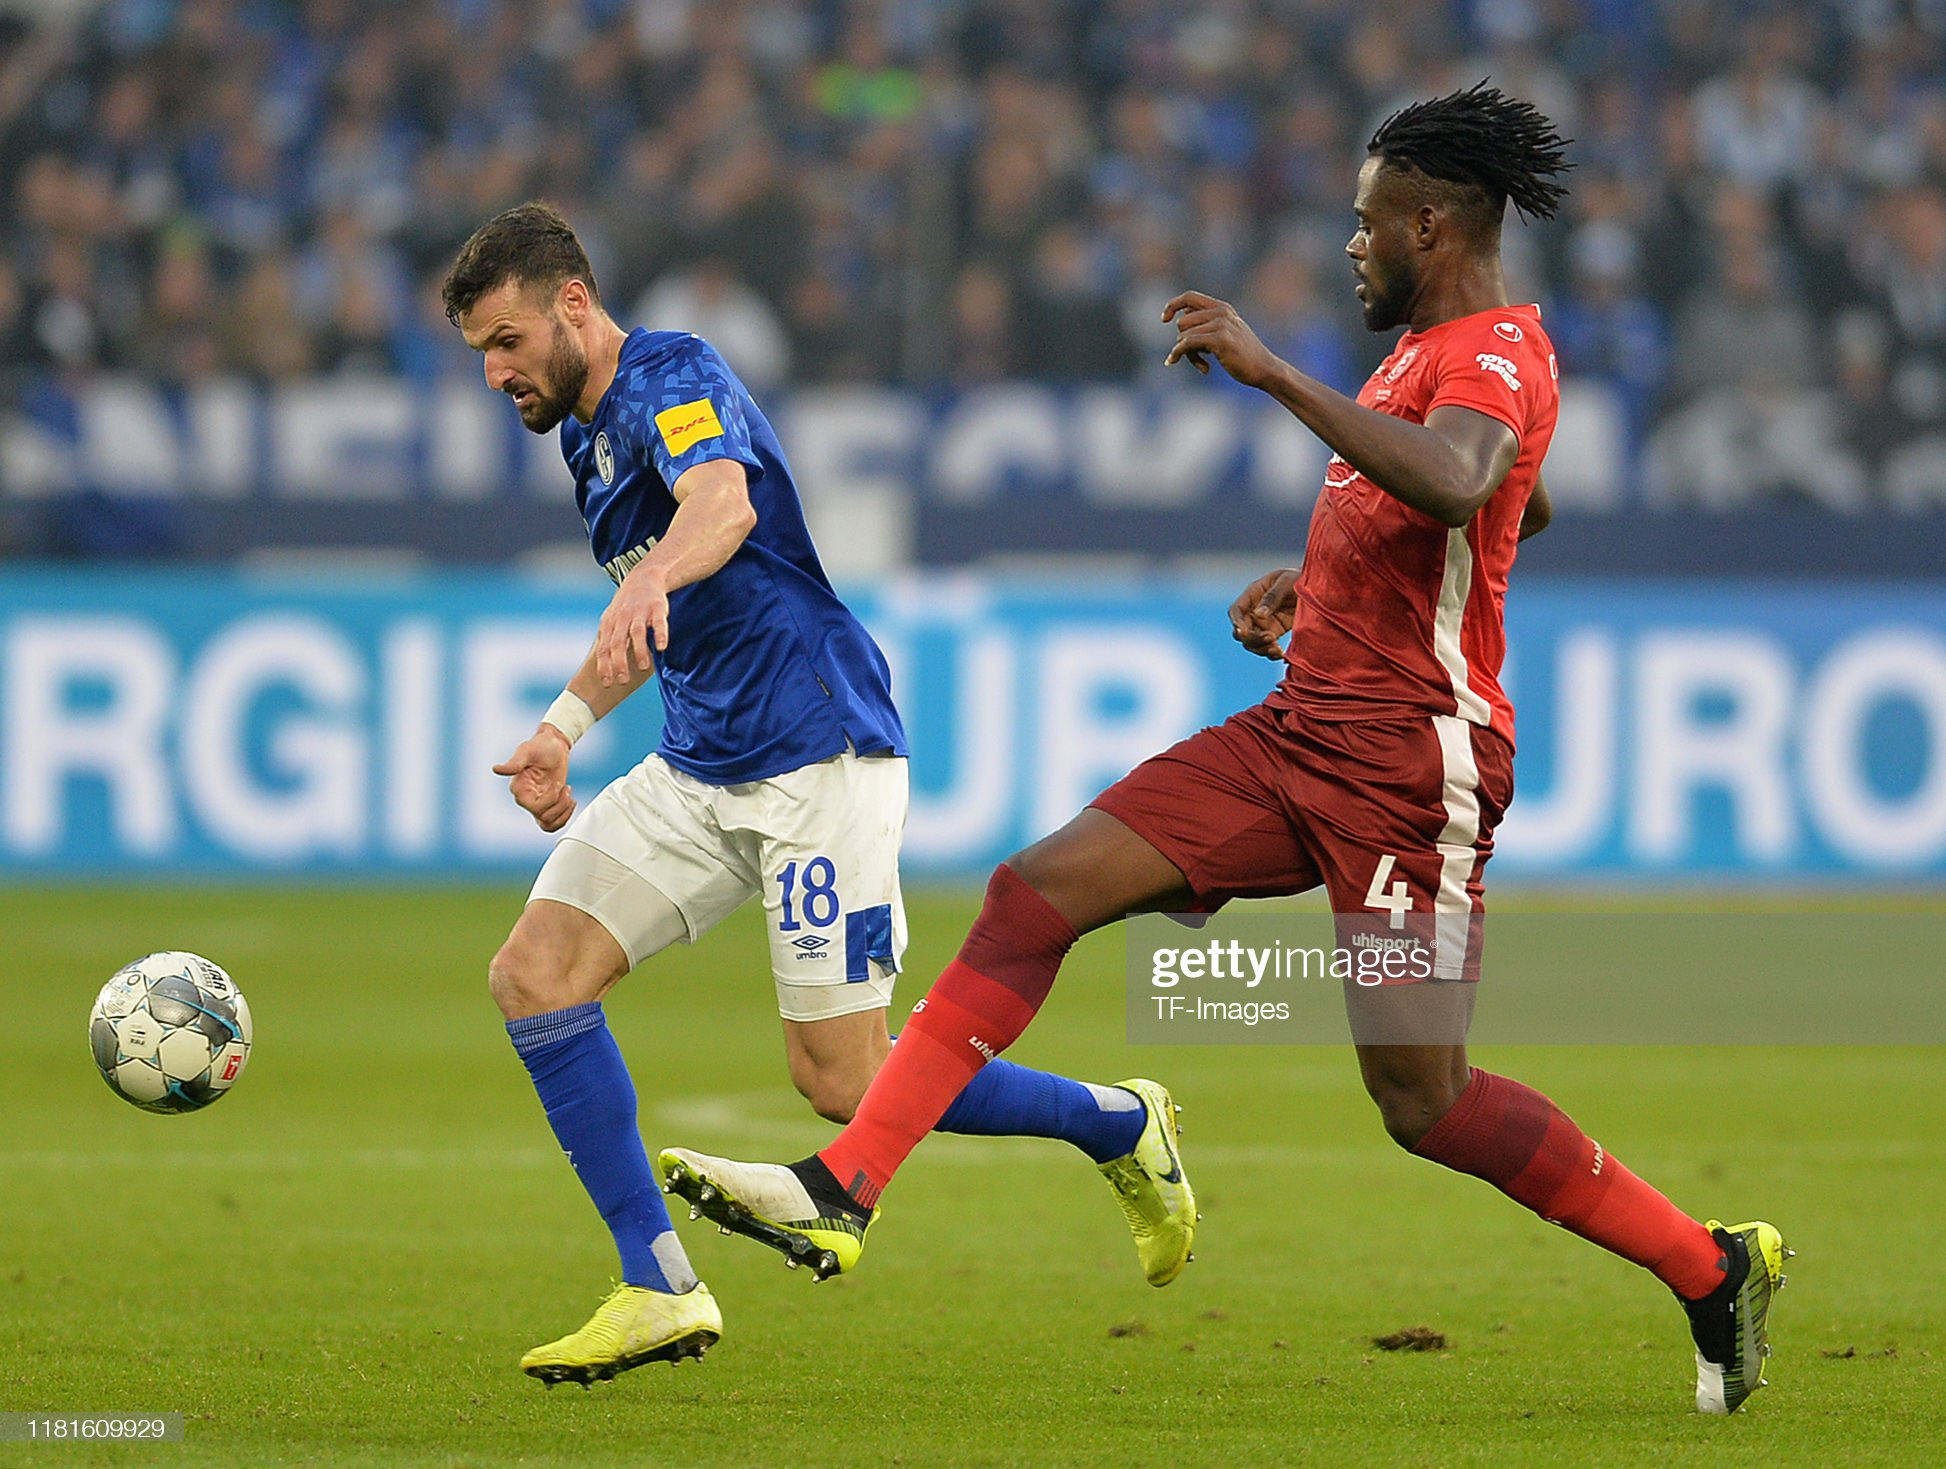 Fortuna Dusseldorf vs Schalke Preview, prediction and odds